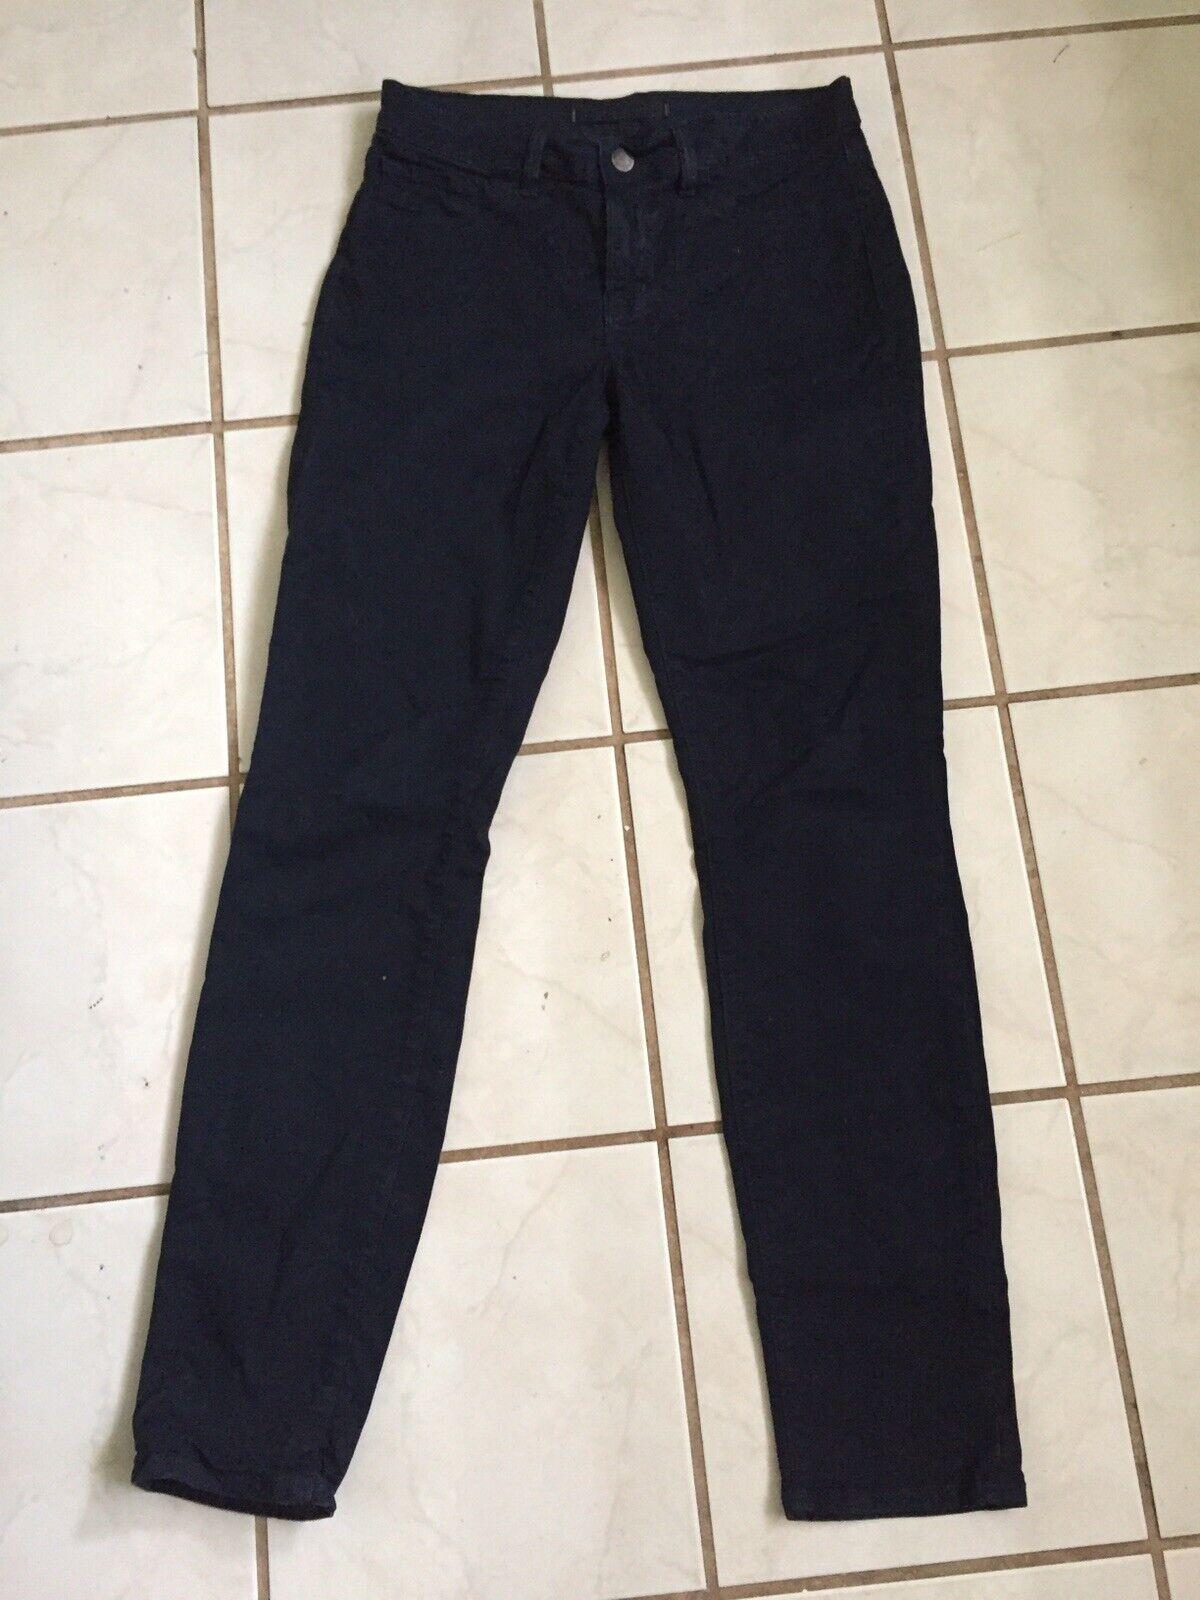 J Brand Women's SKINNY LEG Mid Rise Jeans in Navy Sz 27